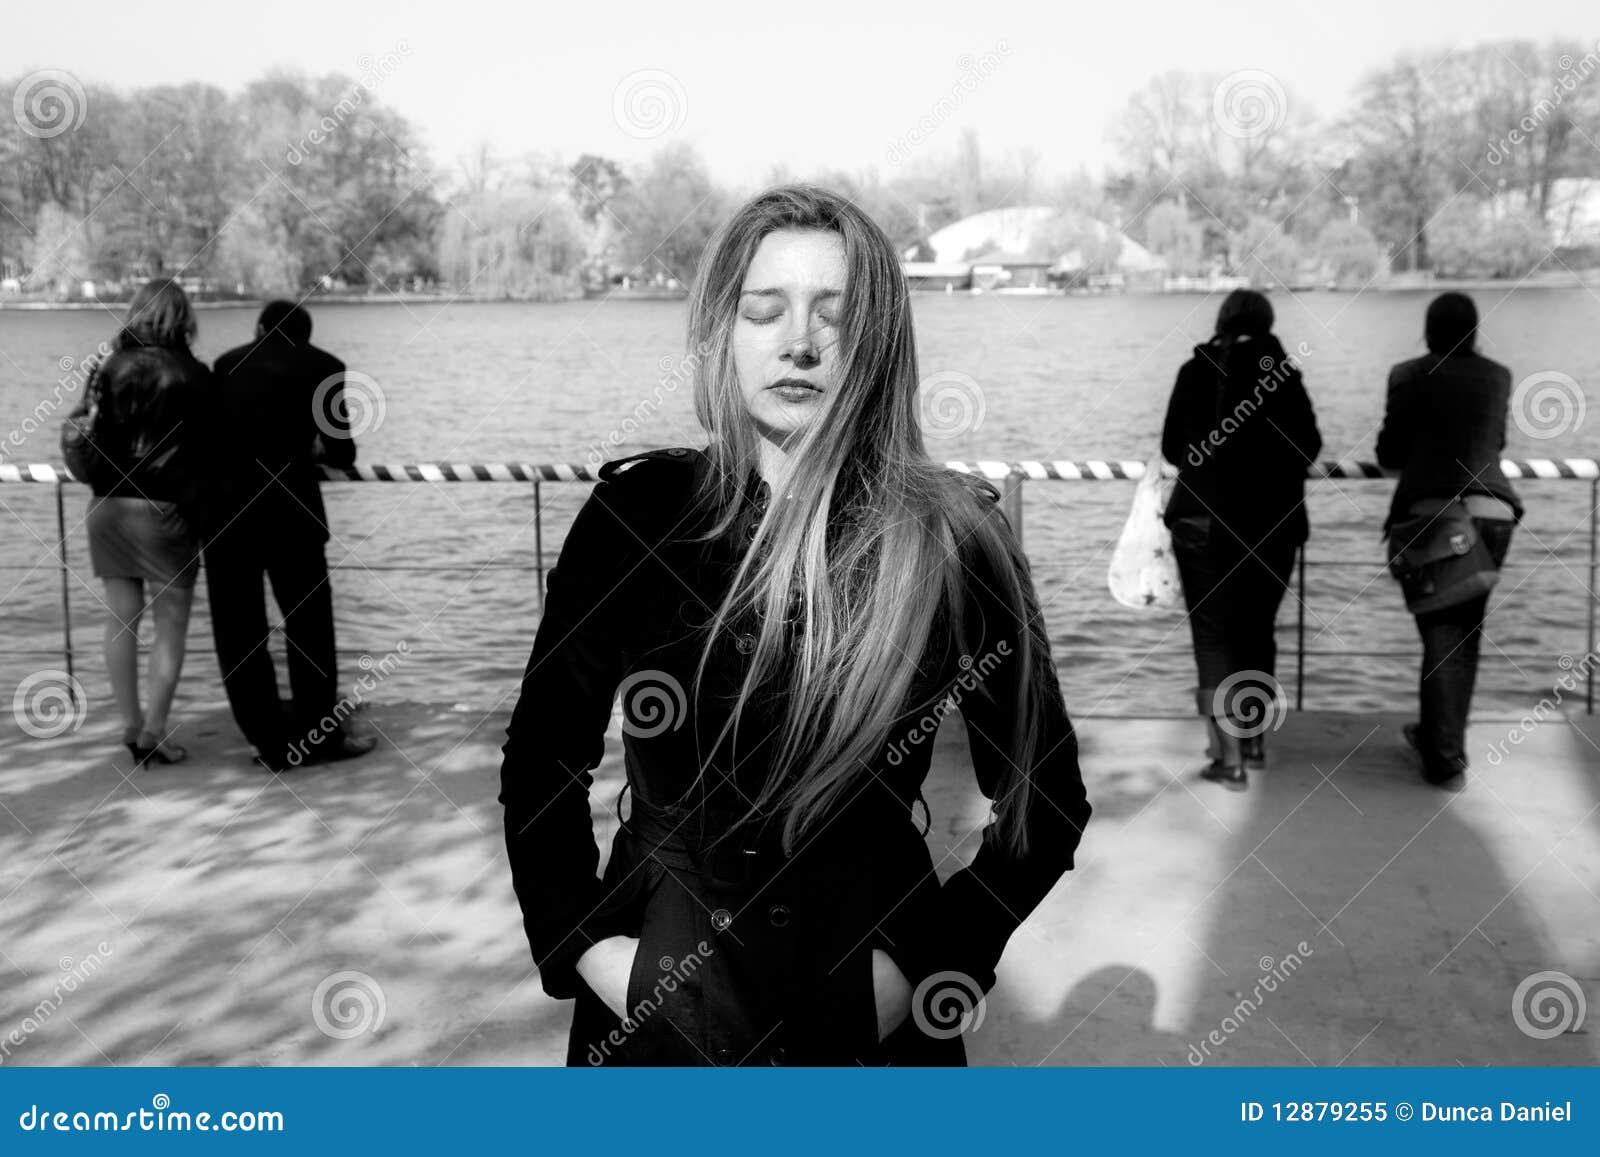 Aislamiento social - mujer infeliz sola triste